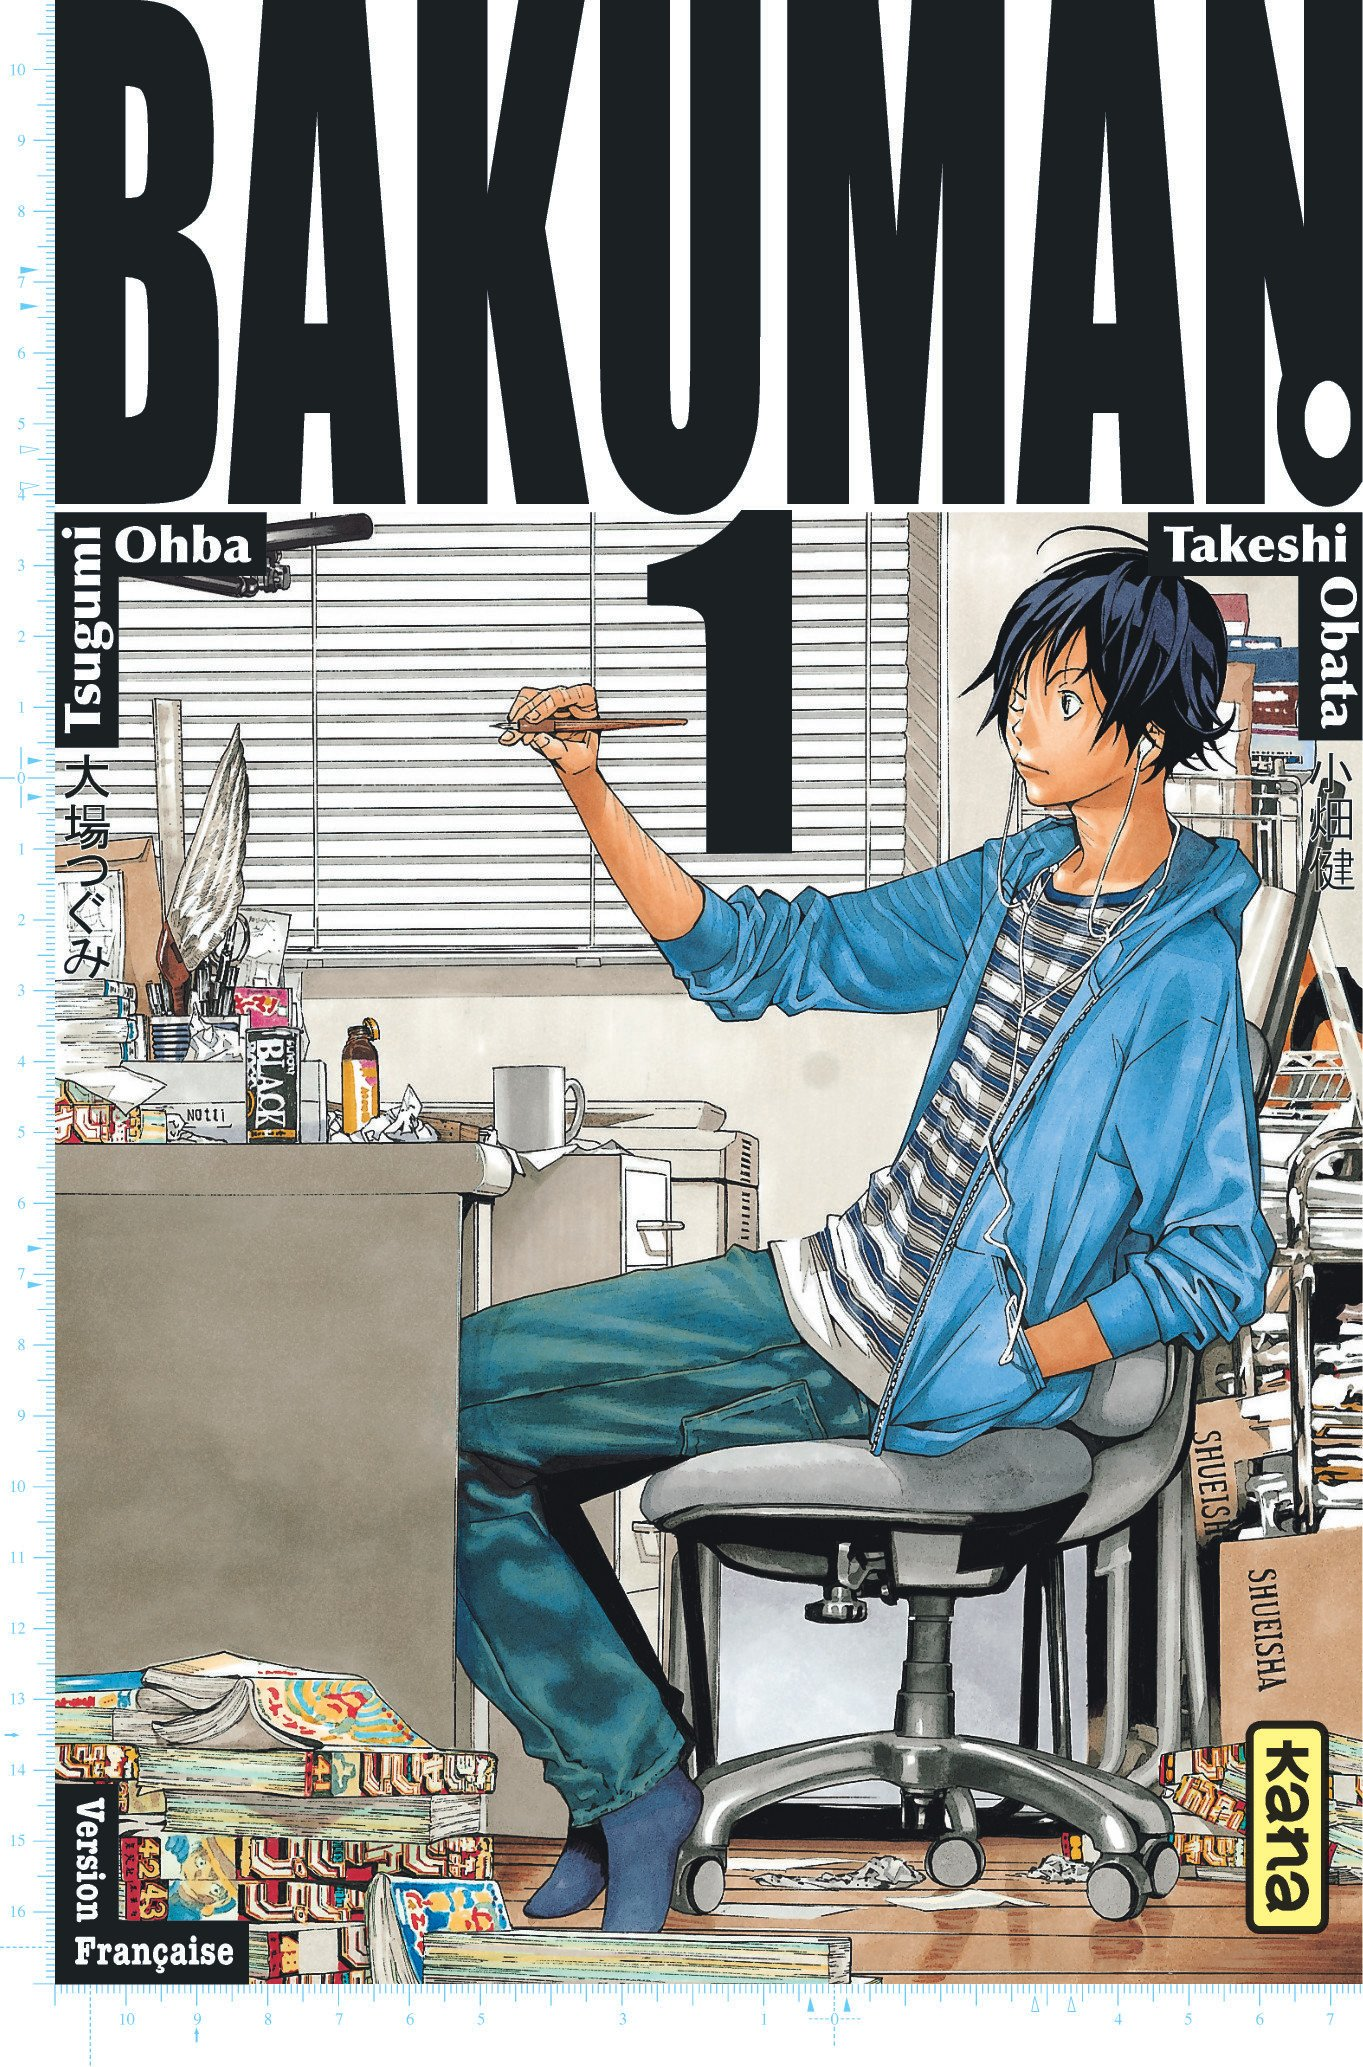 Amazon.fr - Bakuman, tome 1 - Tsugumi Ohba, Takeshi Obata - Livres